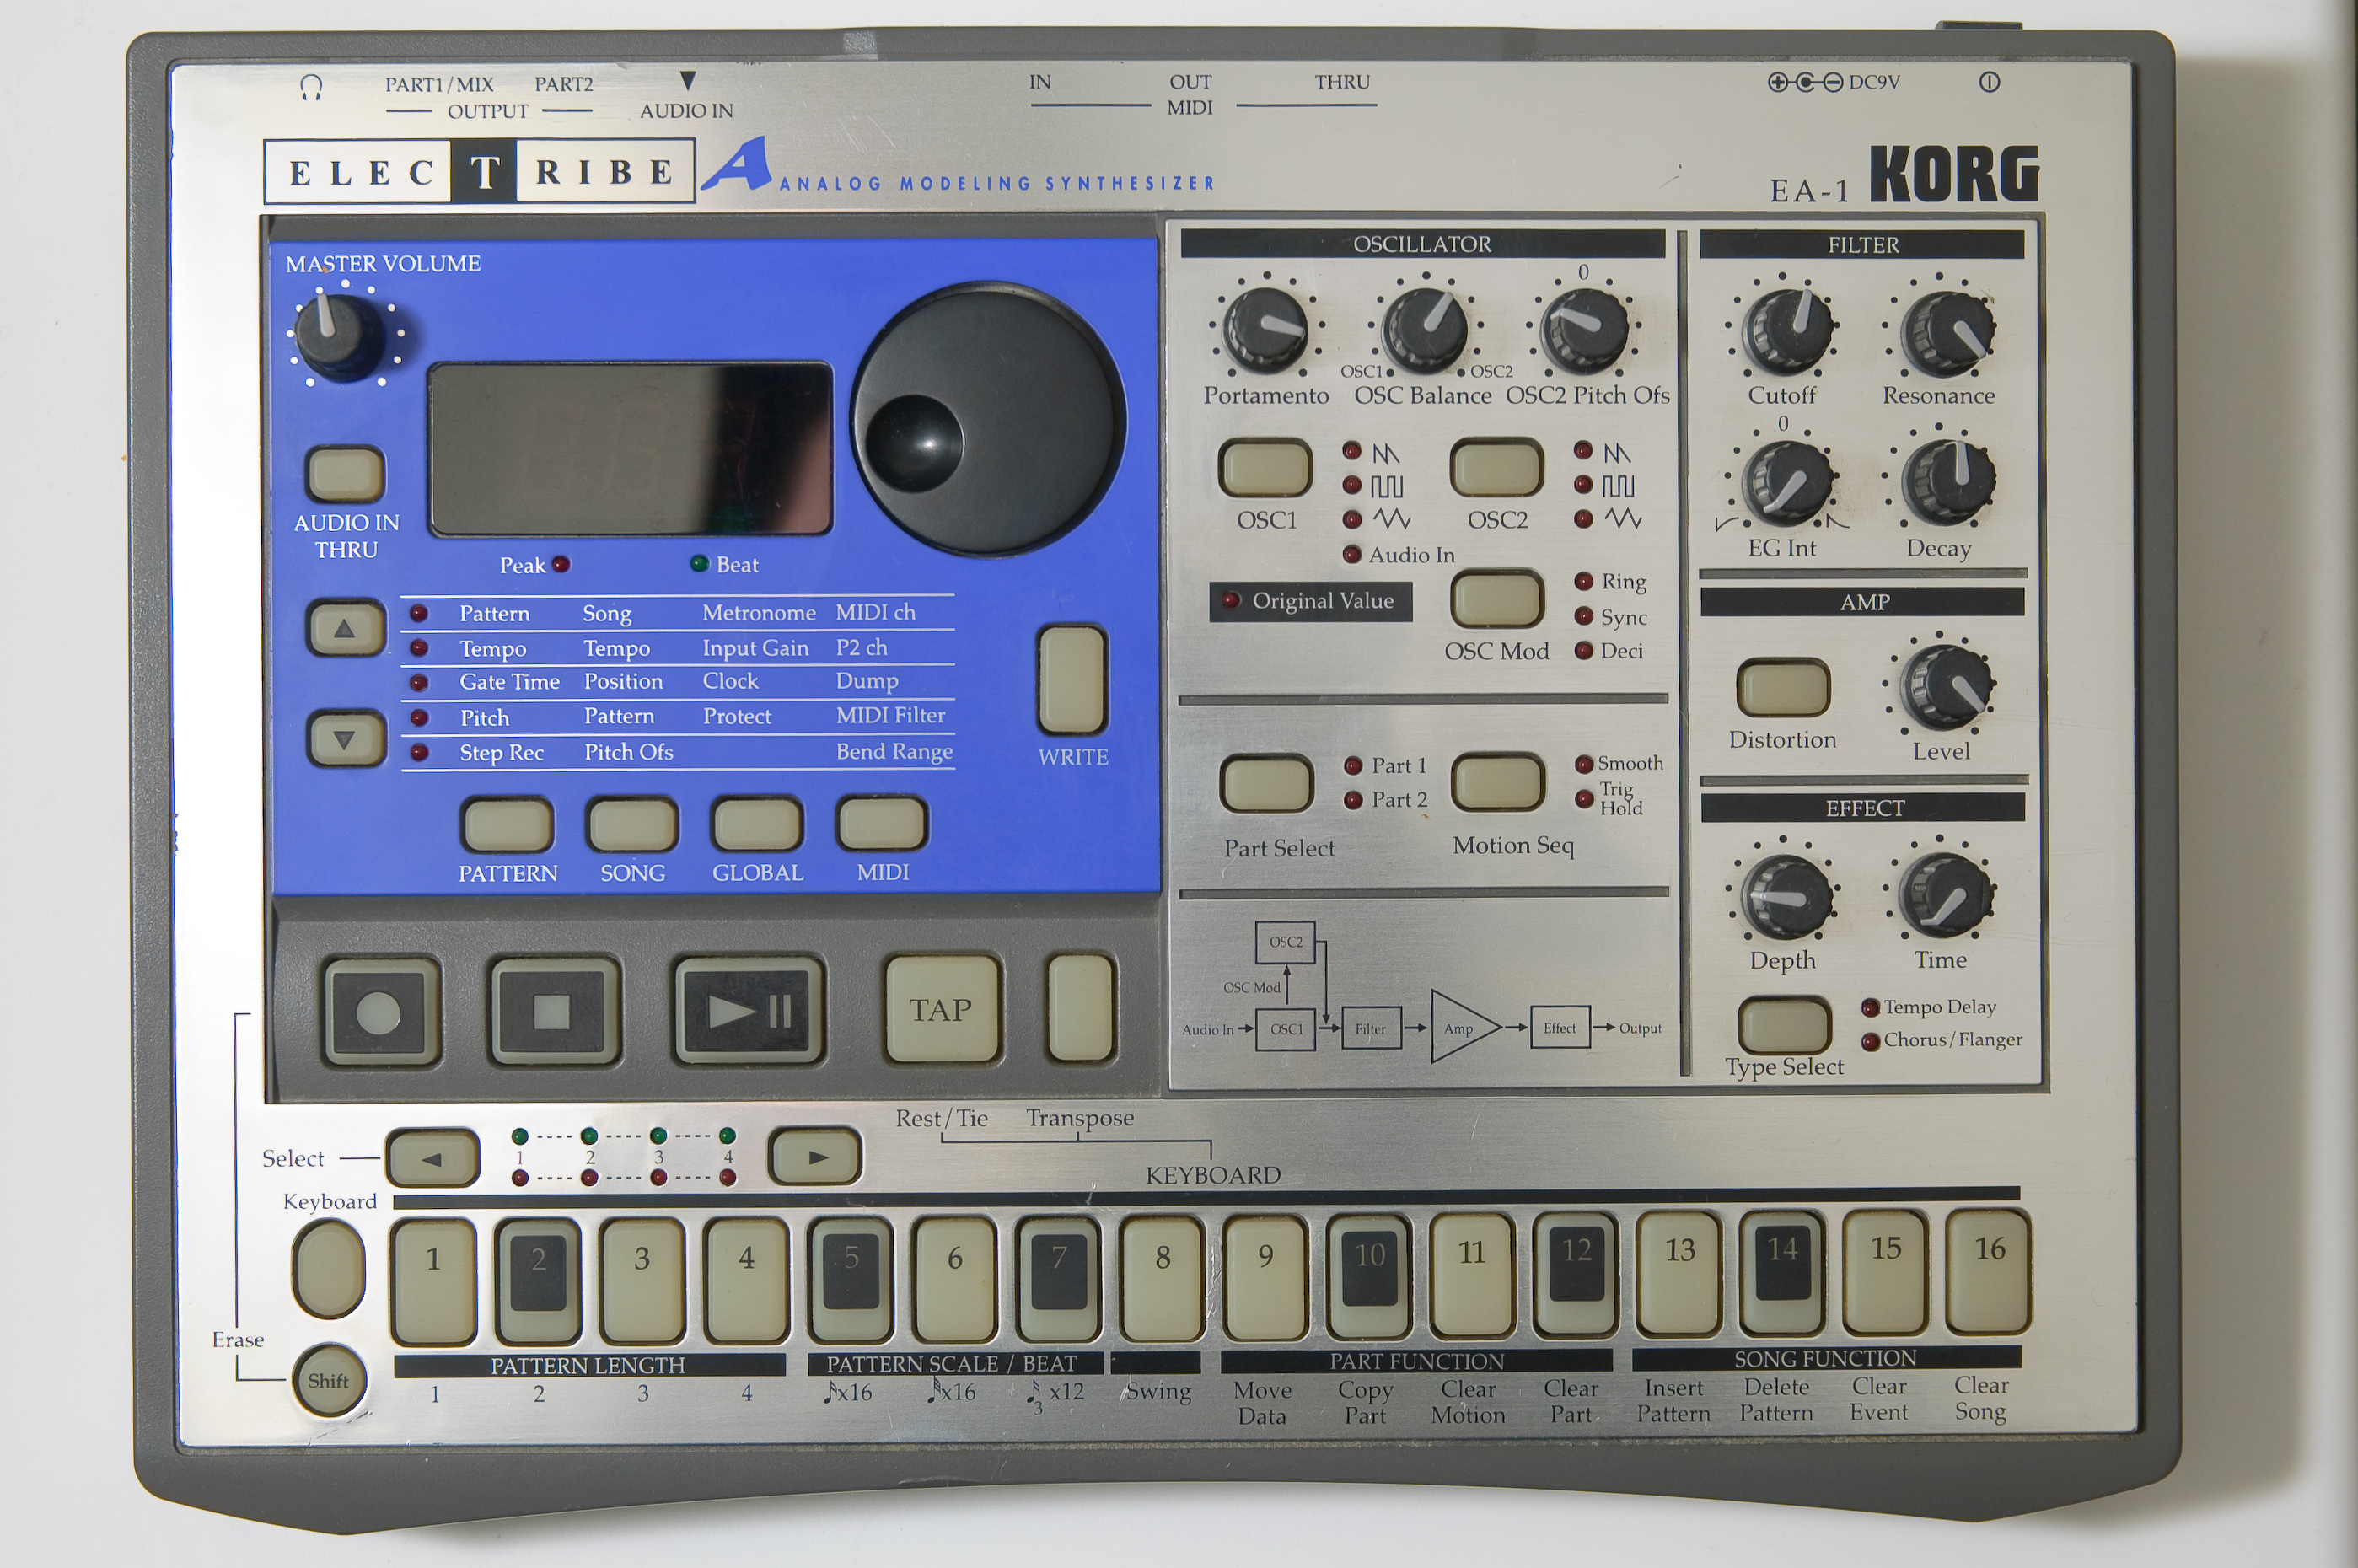 Korg Electribe EM-1 - Wikipedia